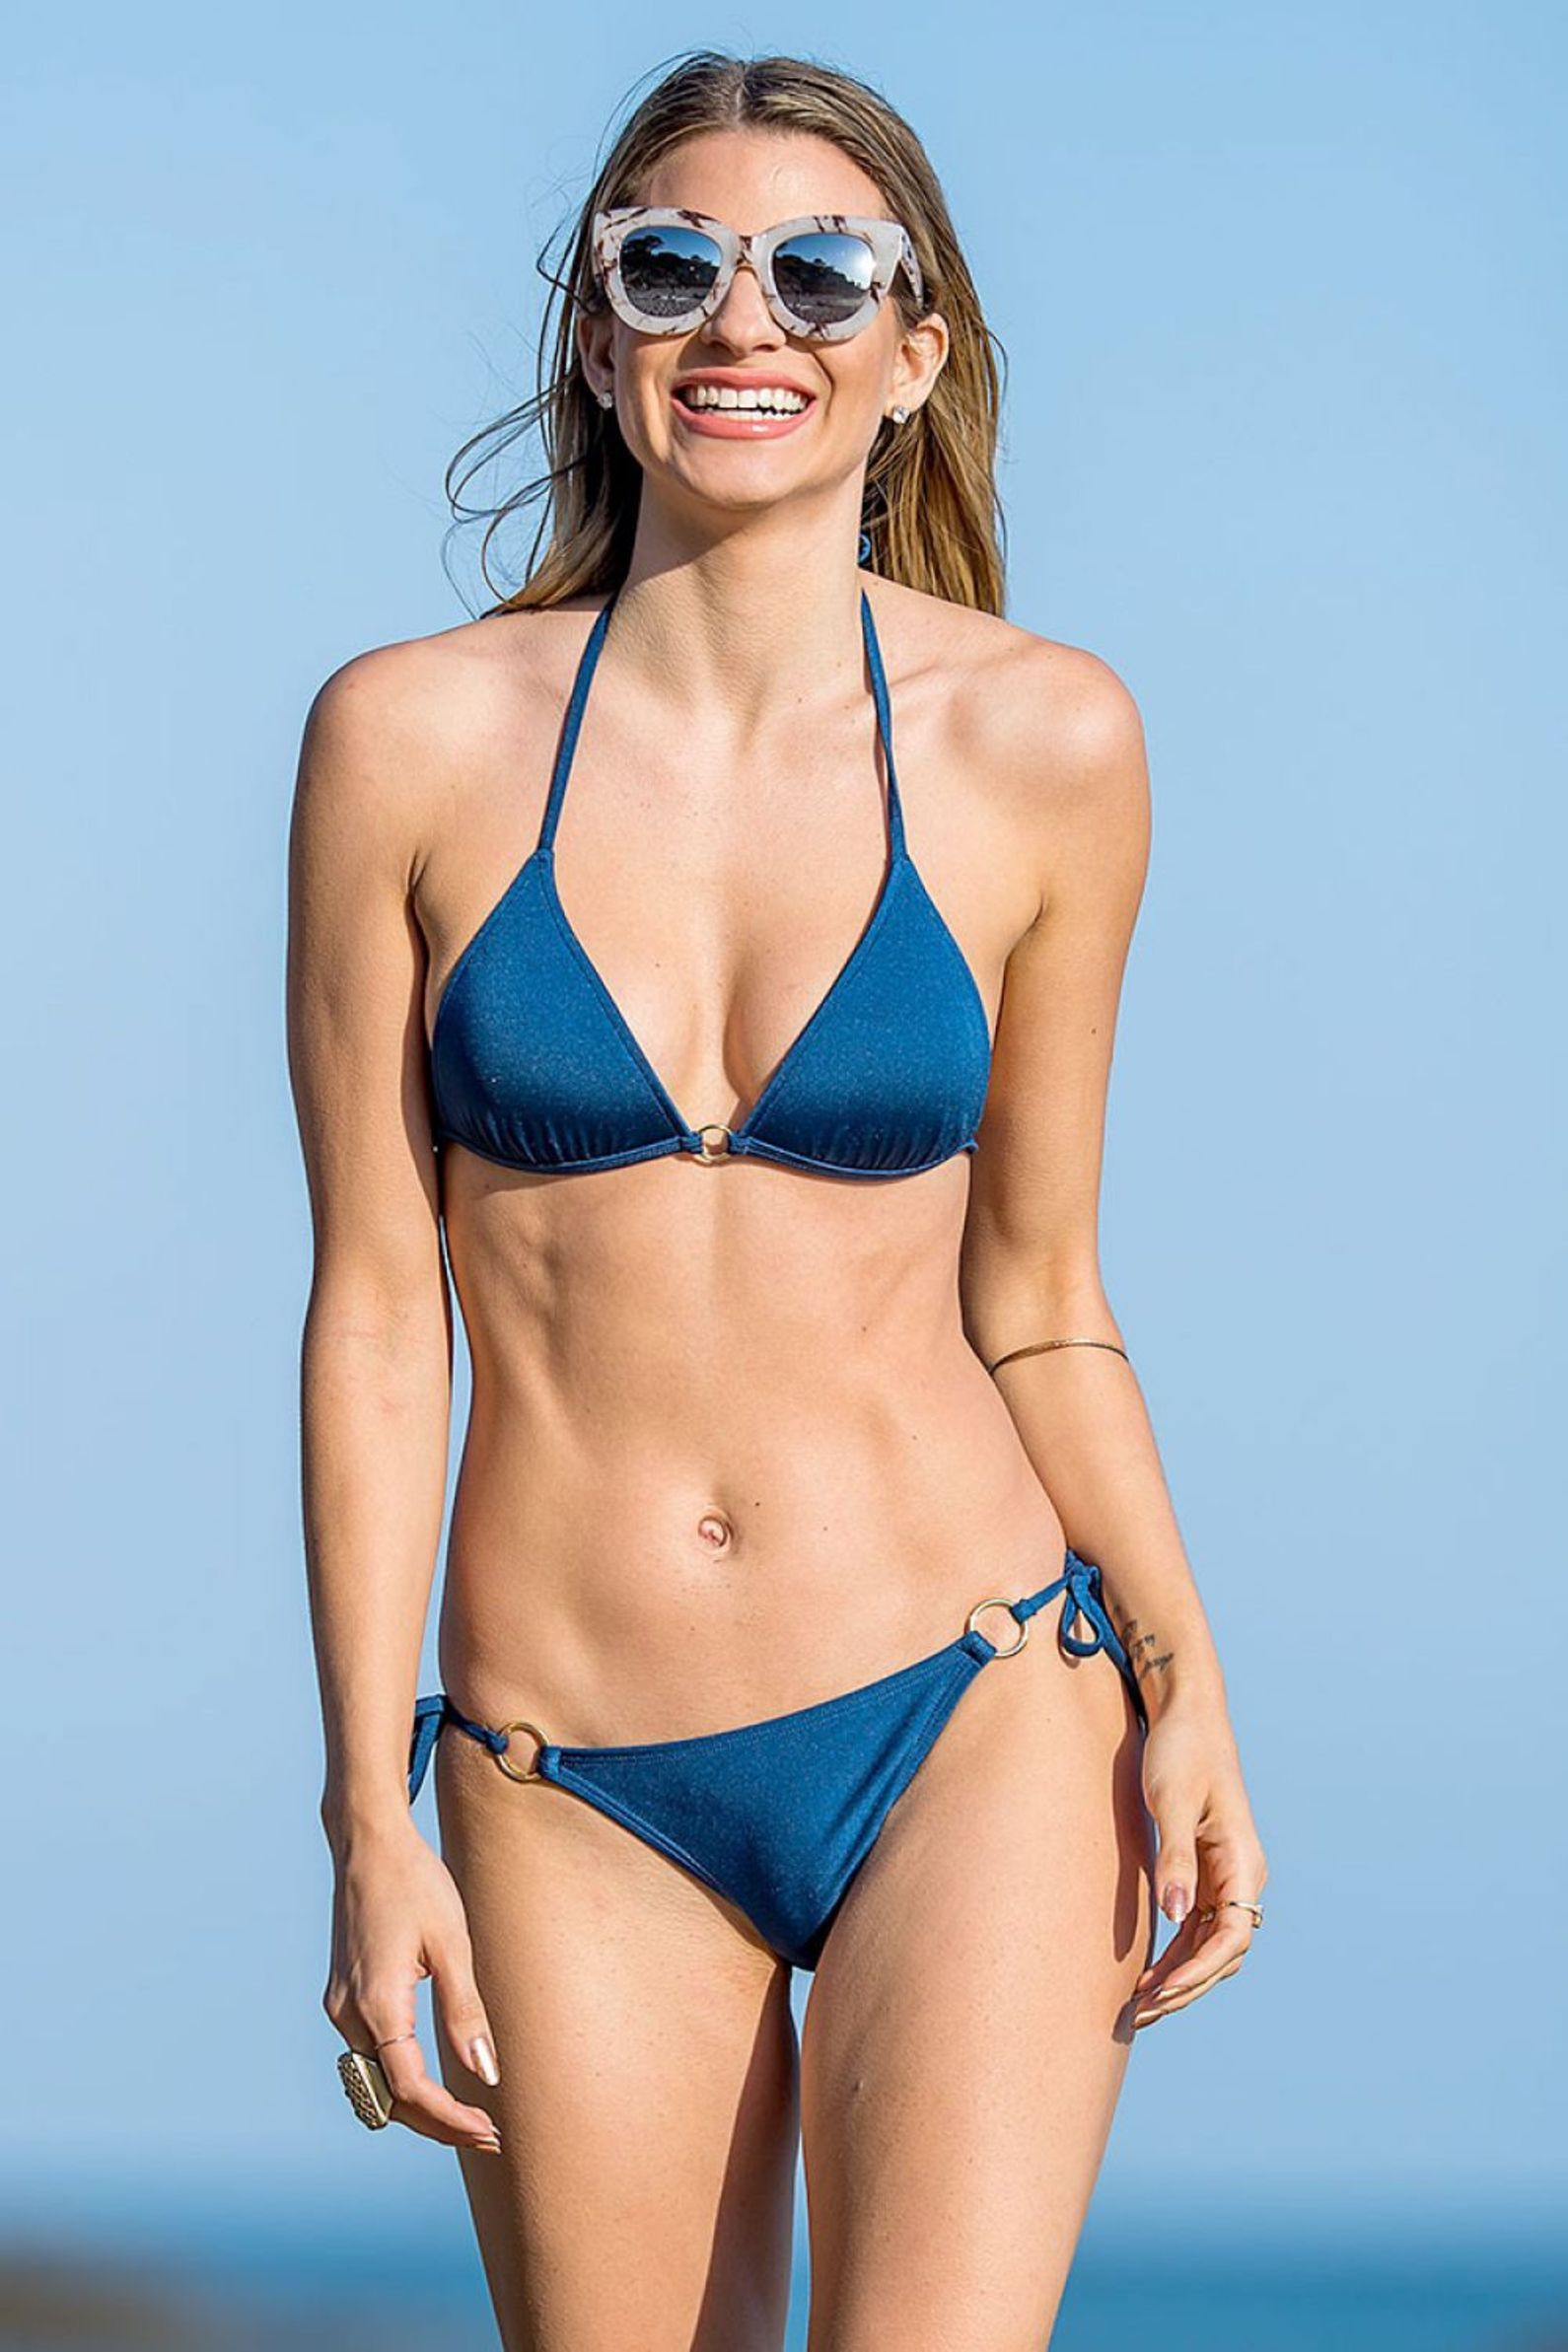 nude (59 photos), Bikini Celebrity photo